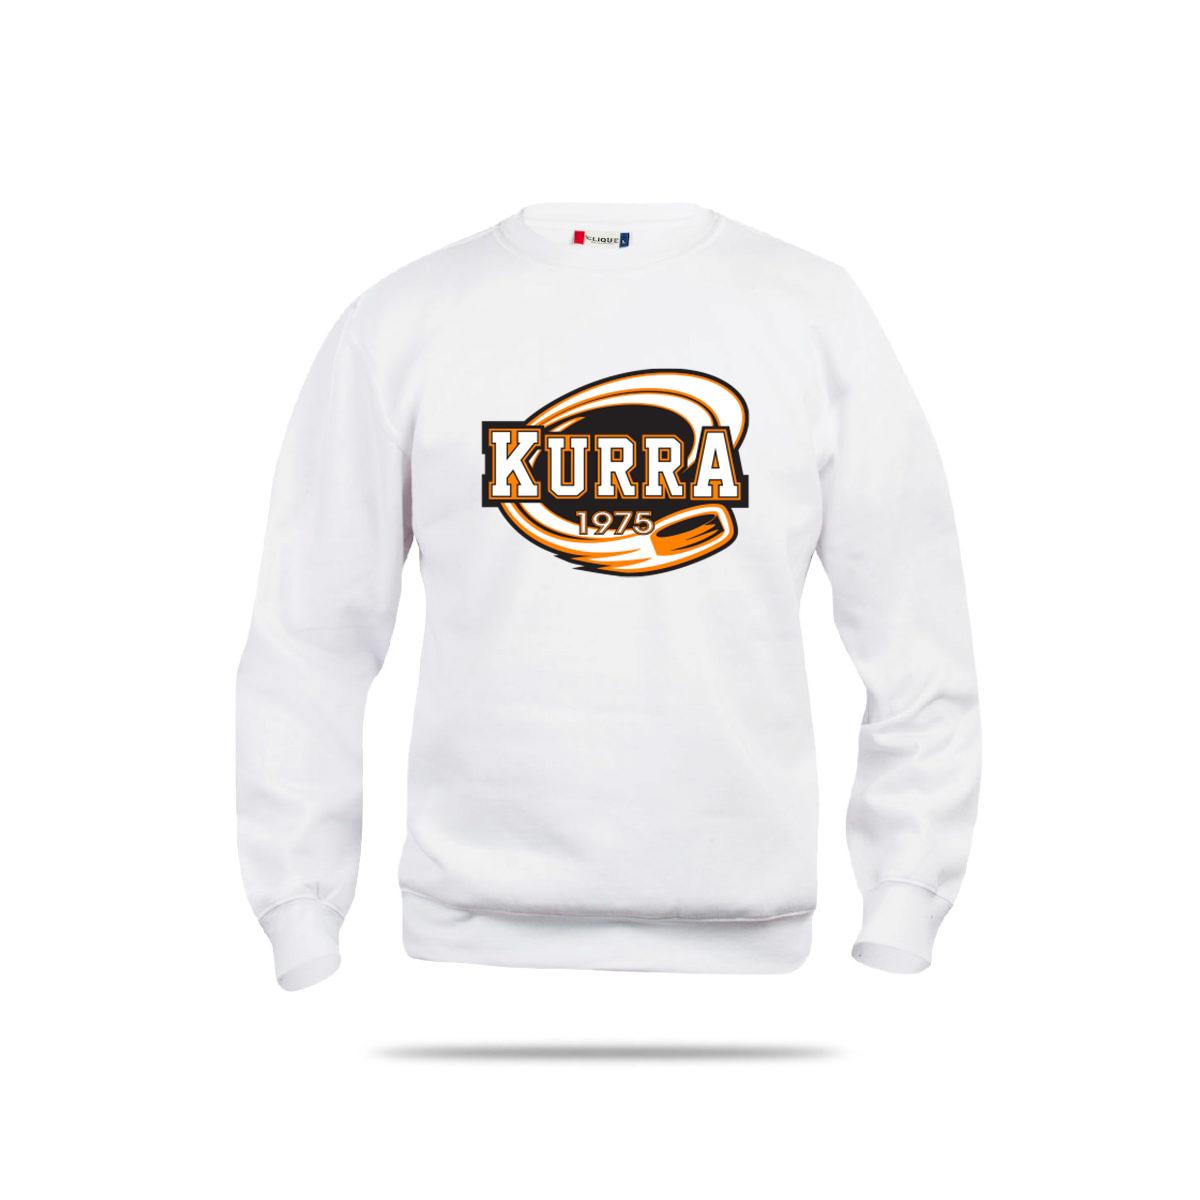 Kurra-Original-3023-valkoinen